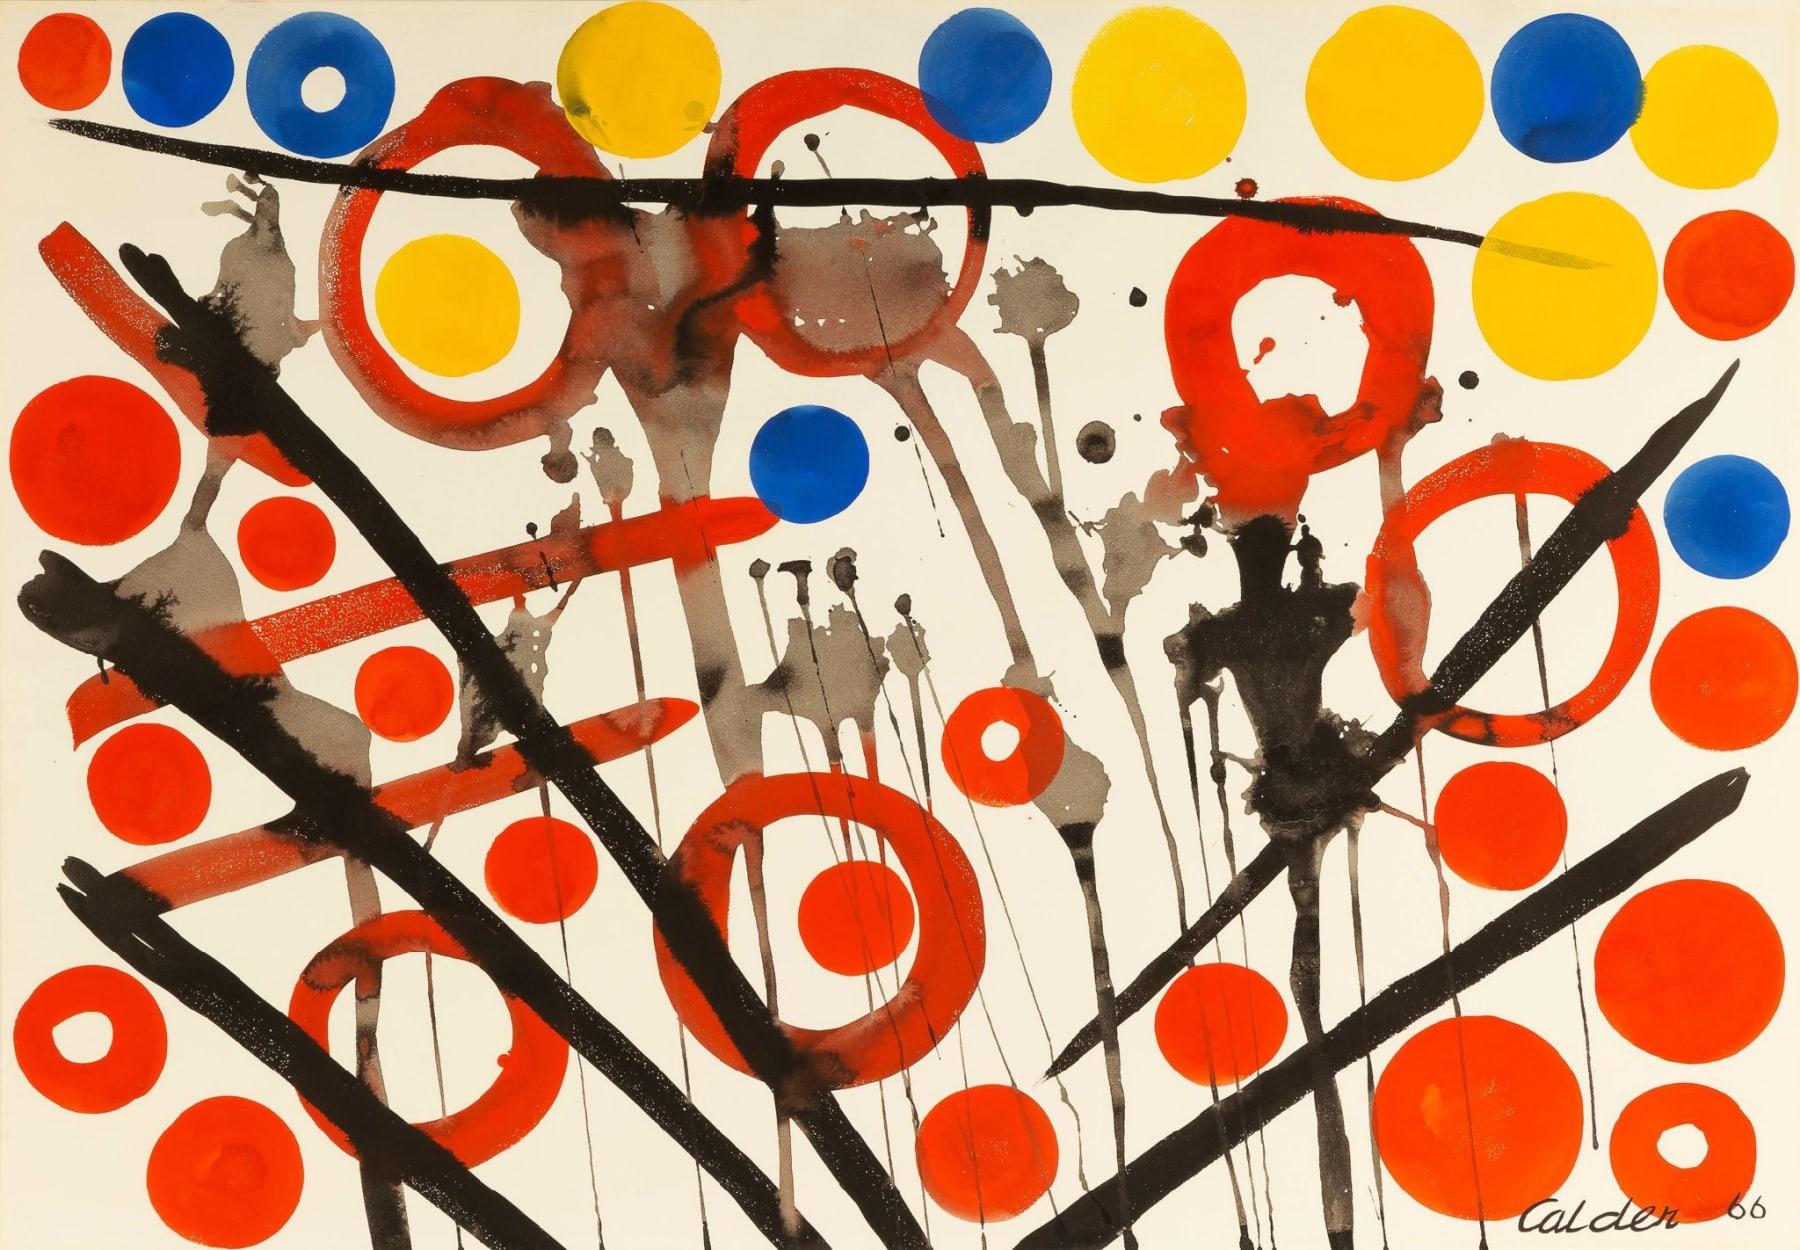 Alexander Calder, Loose Yolks, 1966